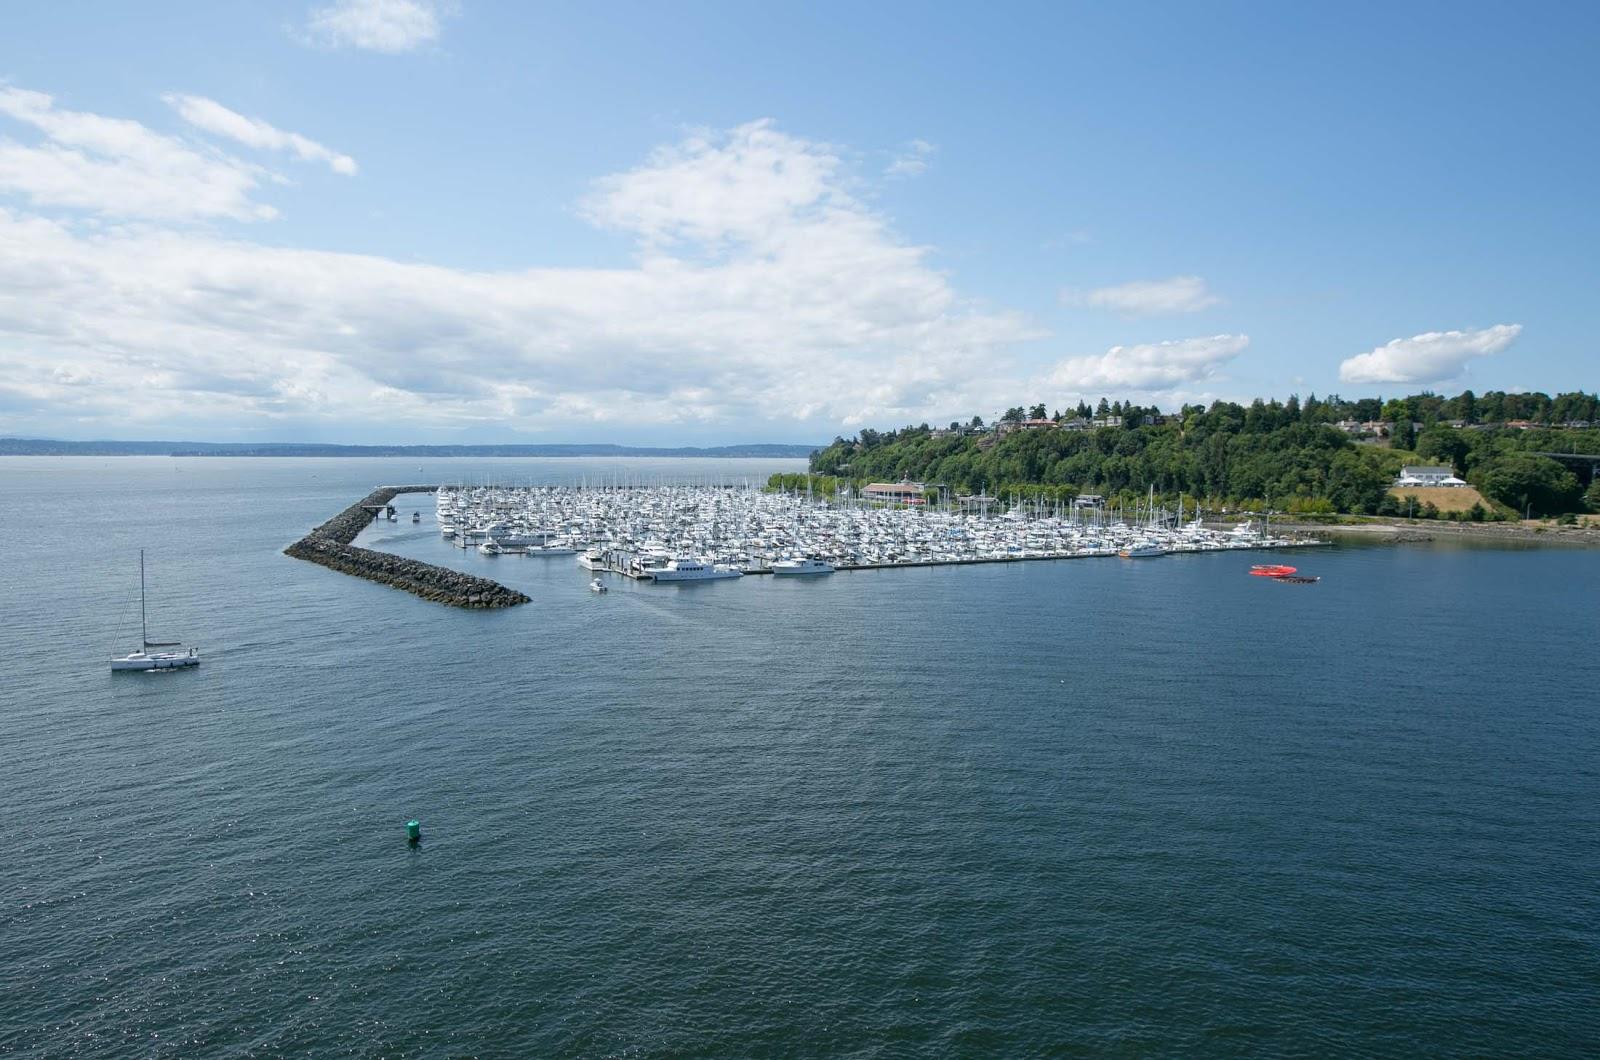 Marina in Seattle's Elliott Bay